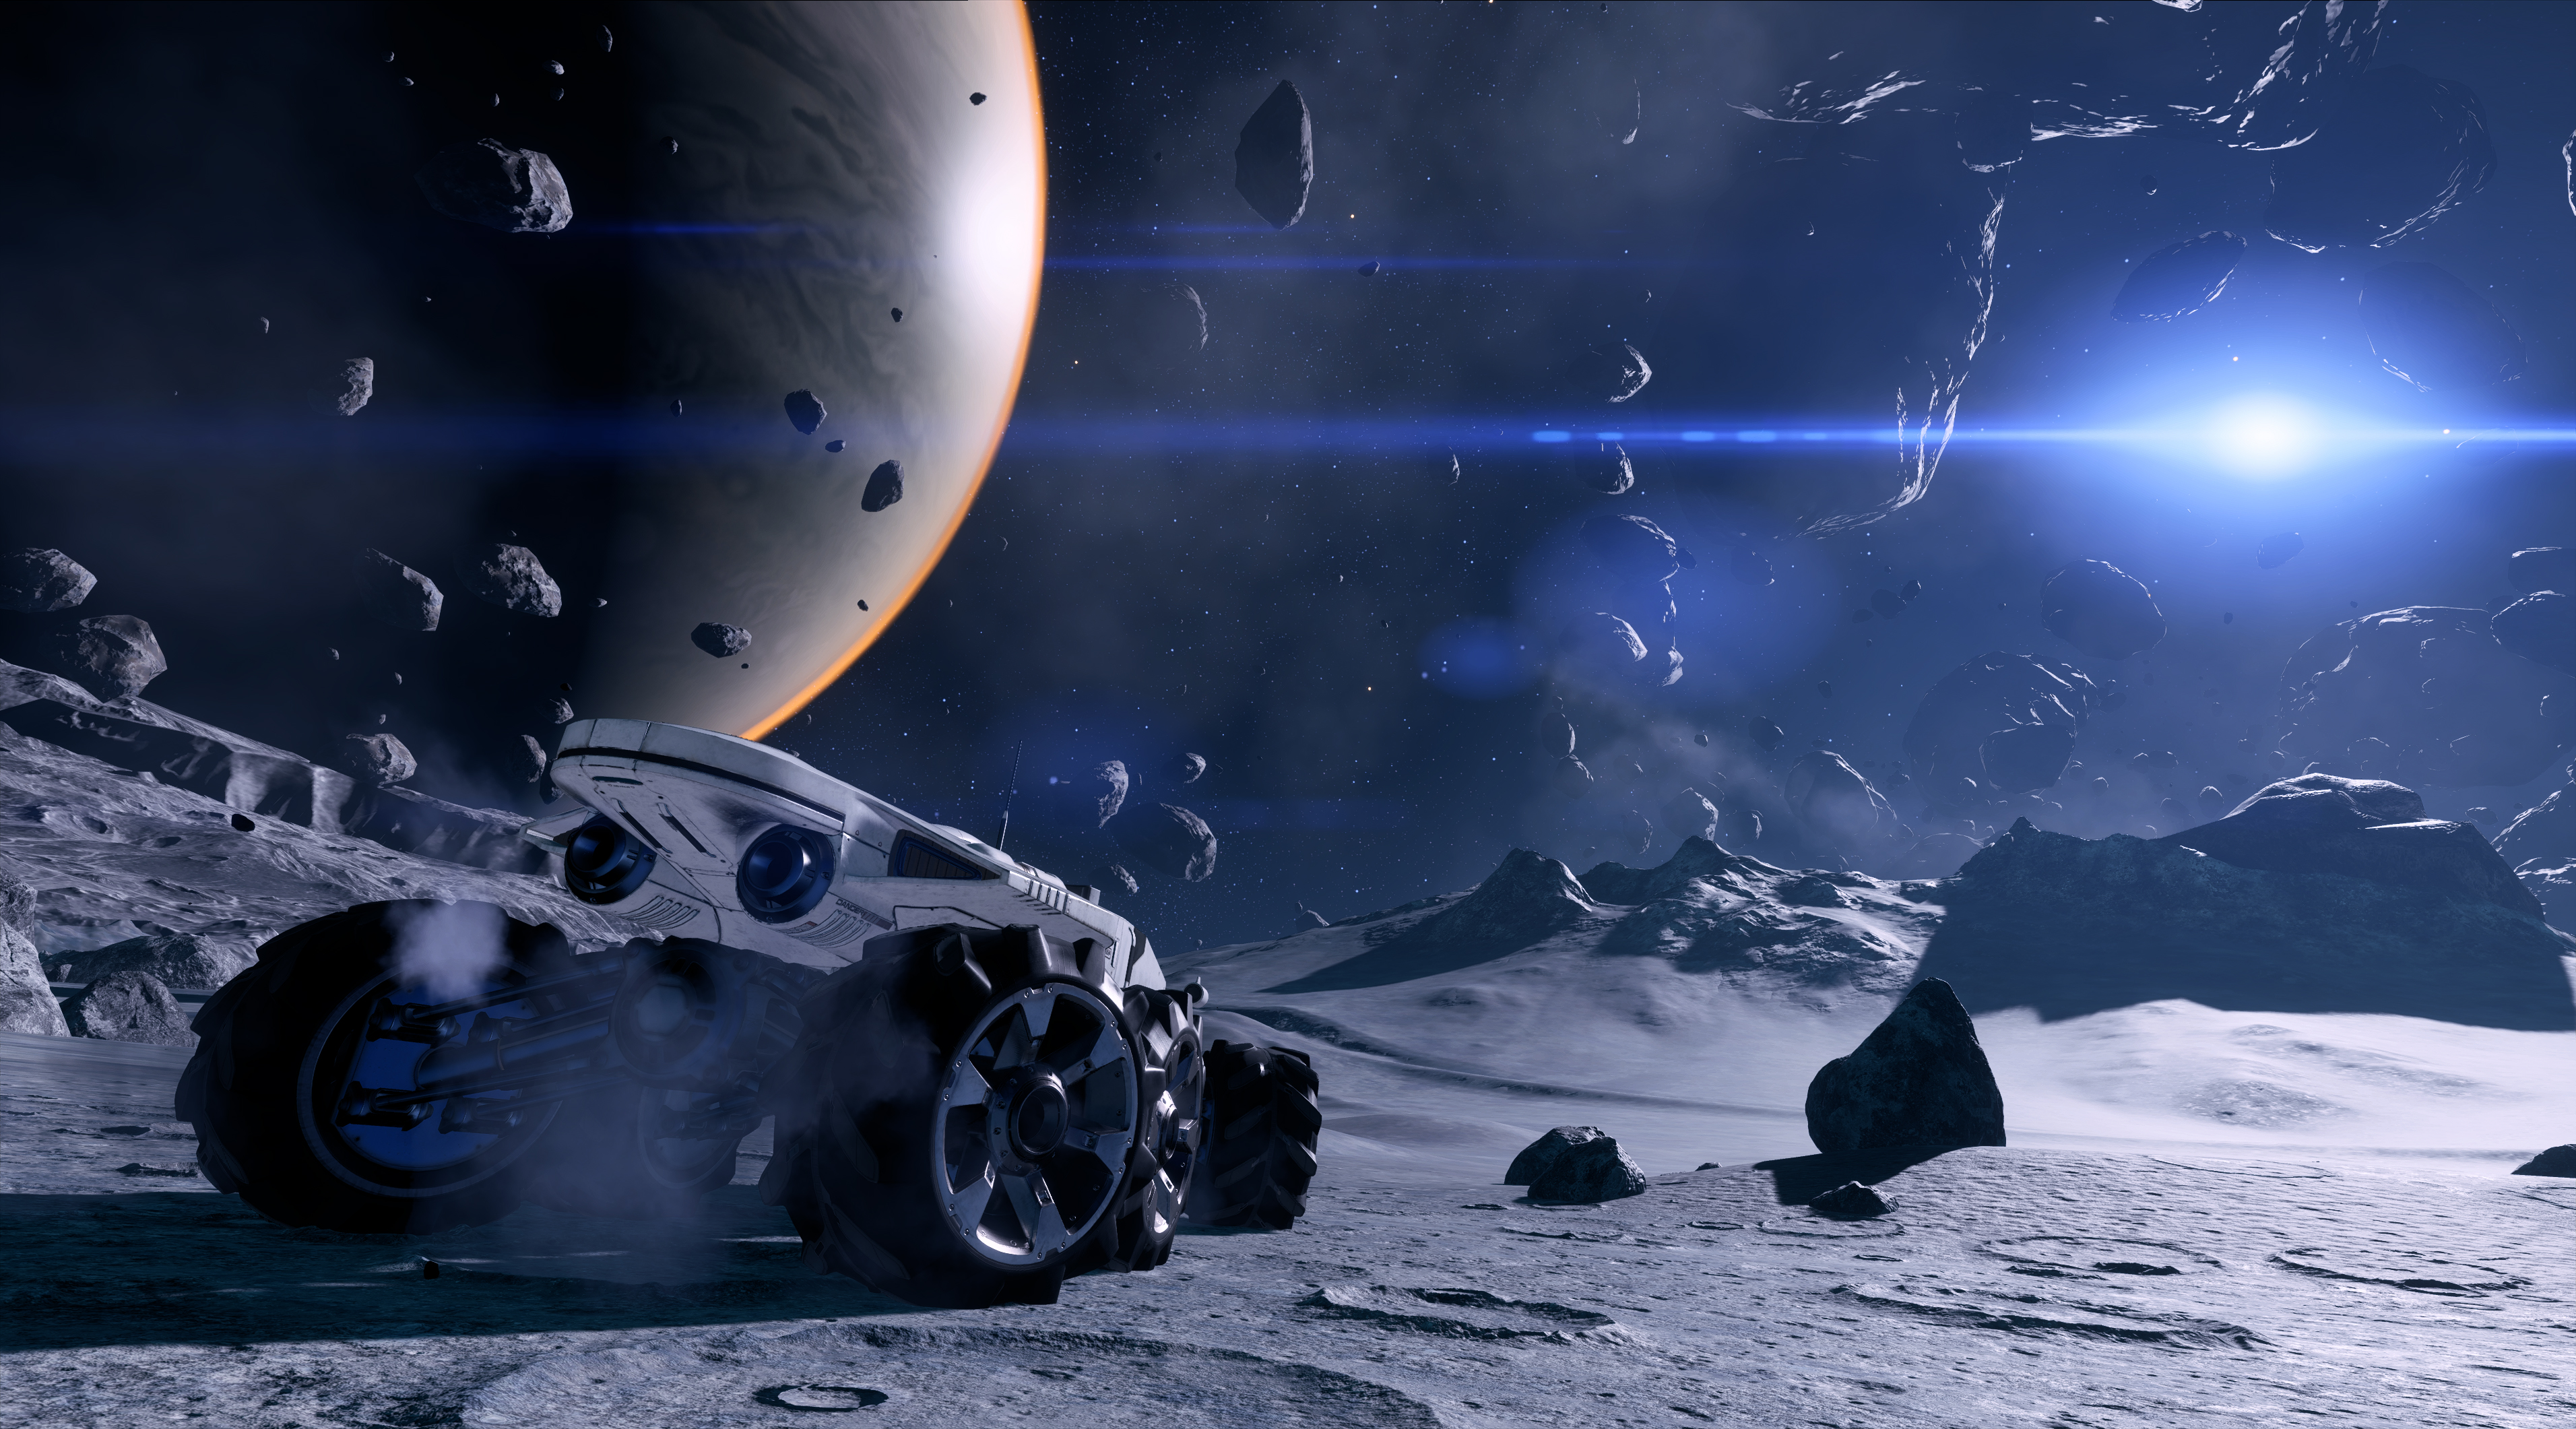 Mass Effect Andromeda - Magazine cover